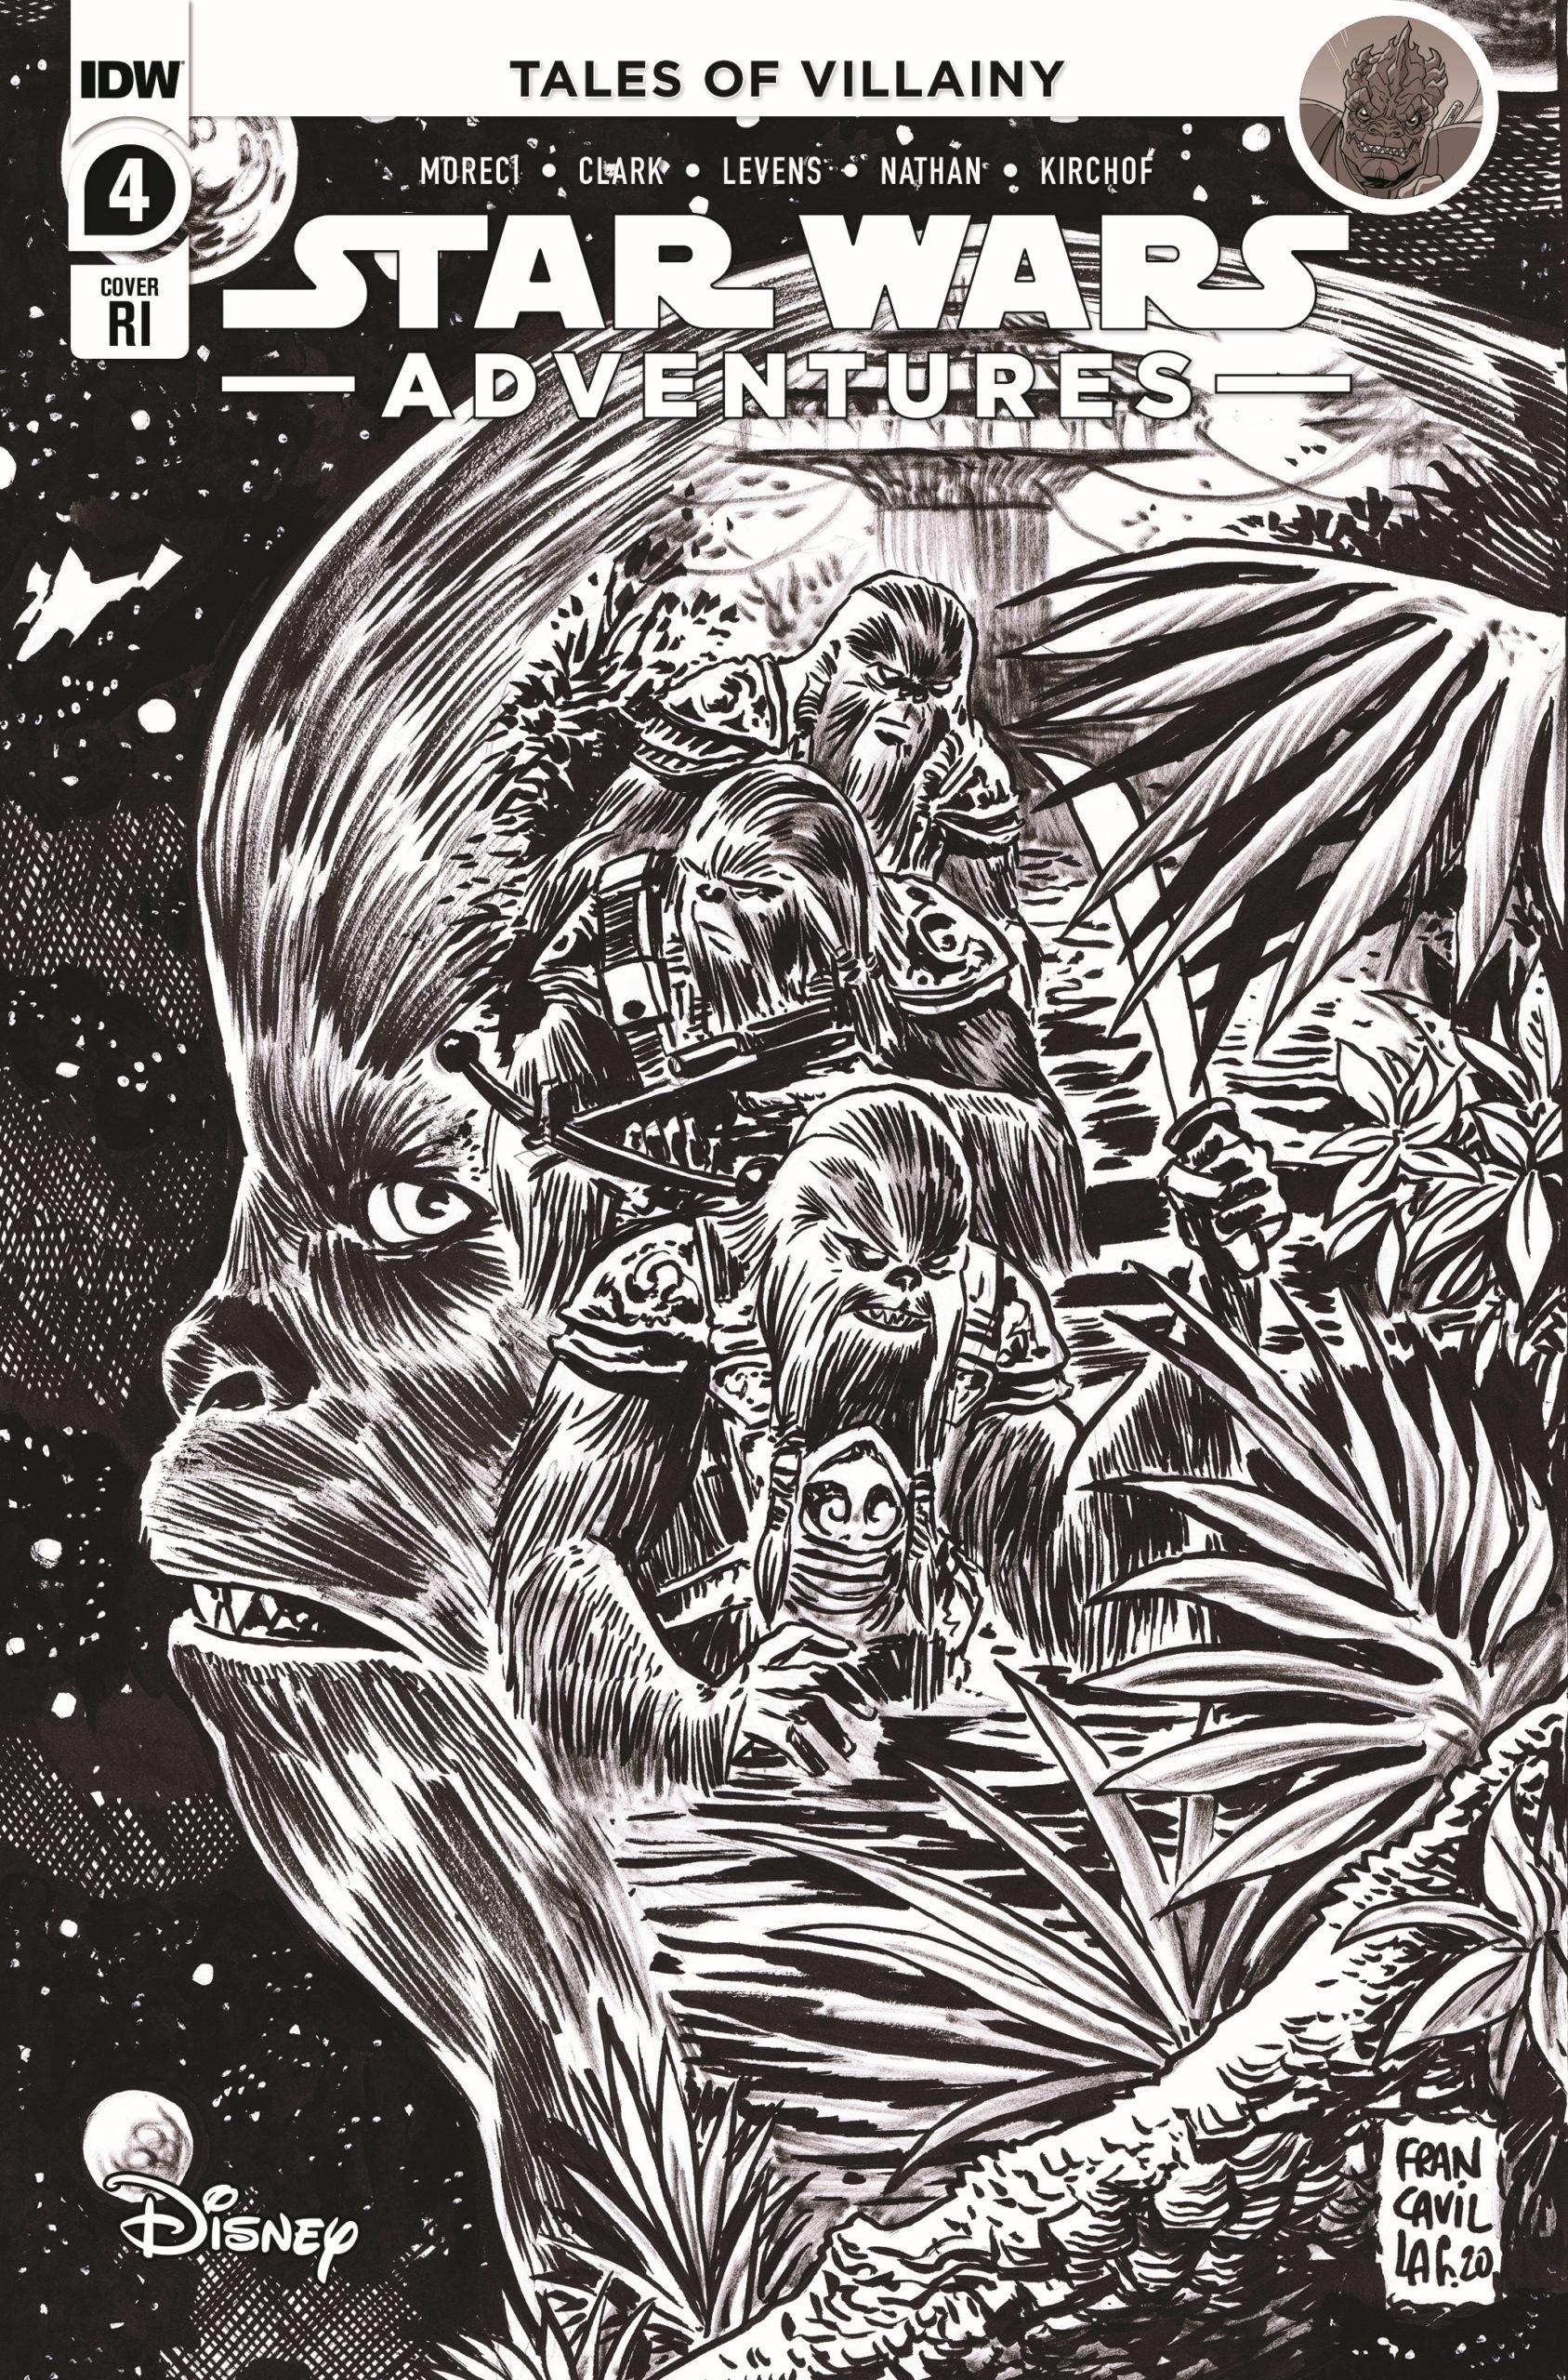 Star Wars Adventures #4 (Francesco Francavilla Black & White Variant Cover) (02.12.2020)